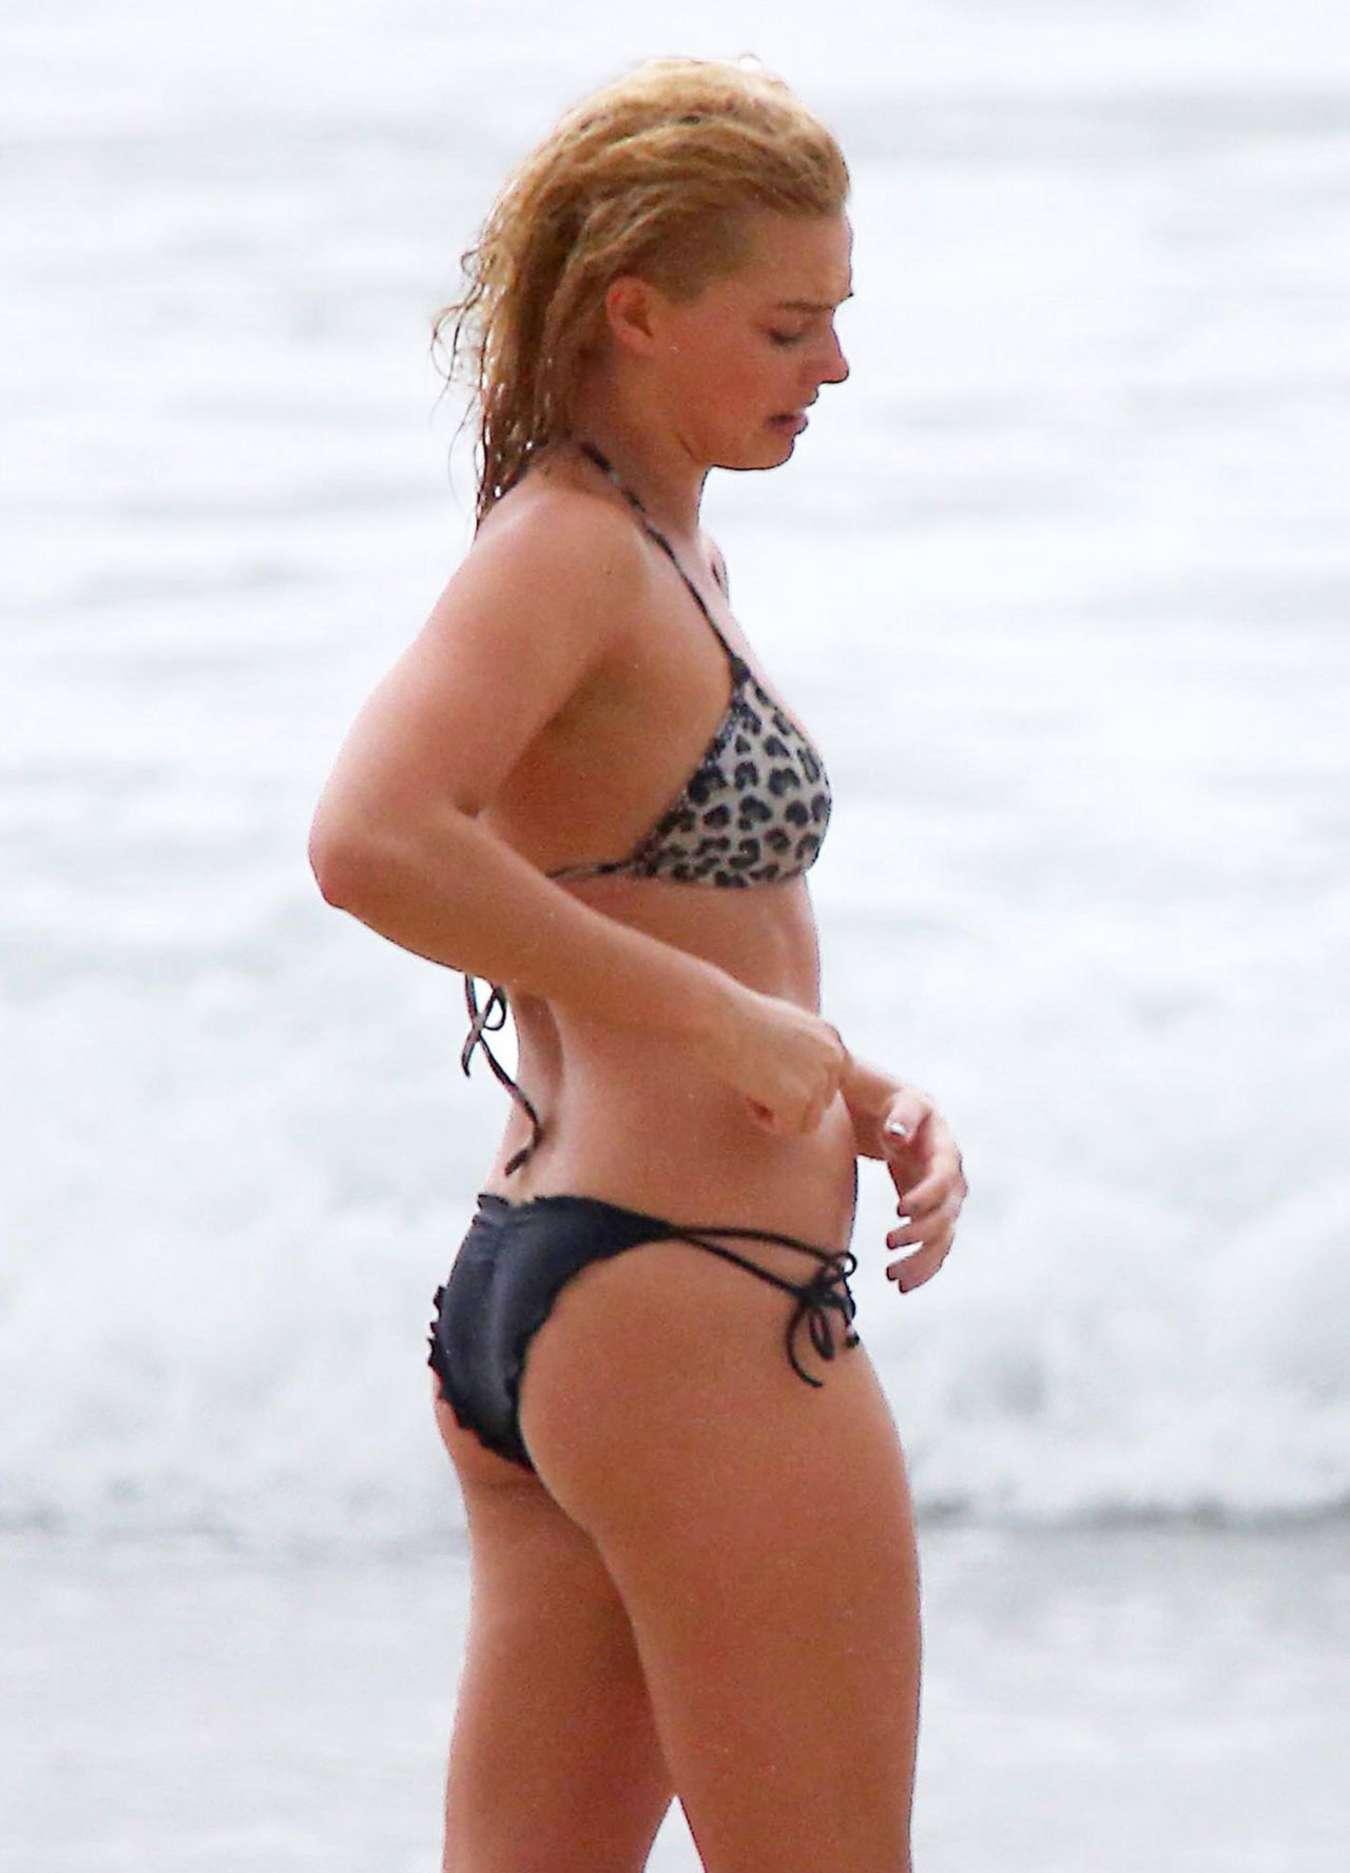 Tonya Harding Angry >> Margot Robbie in Bikini -01 - GotCeleb